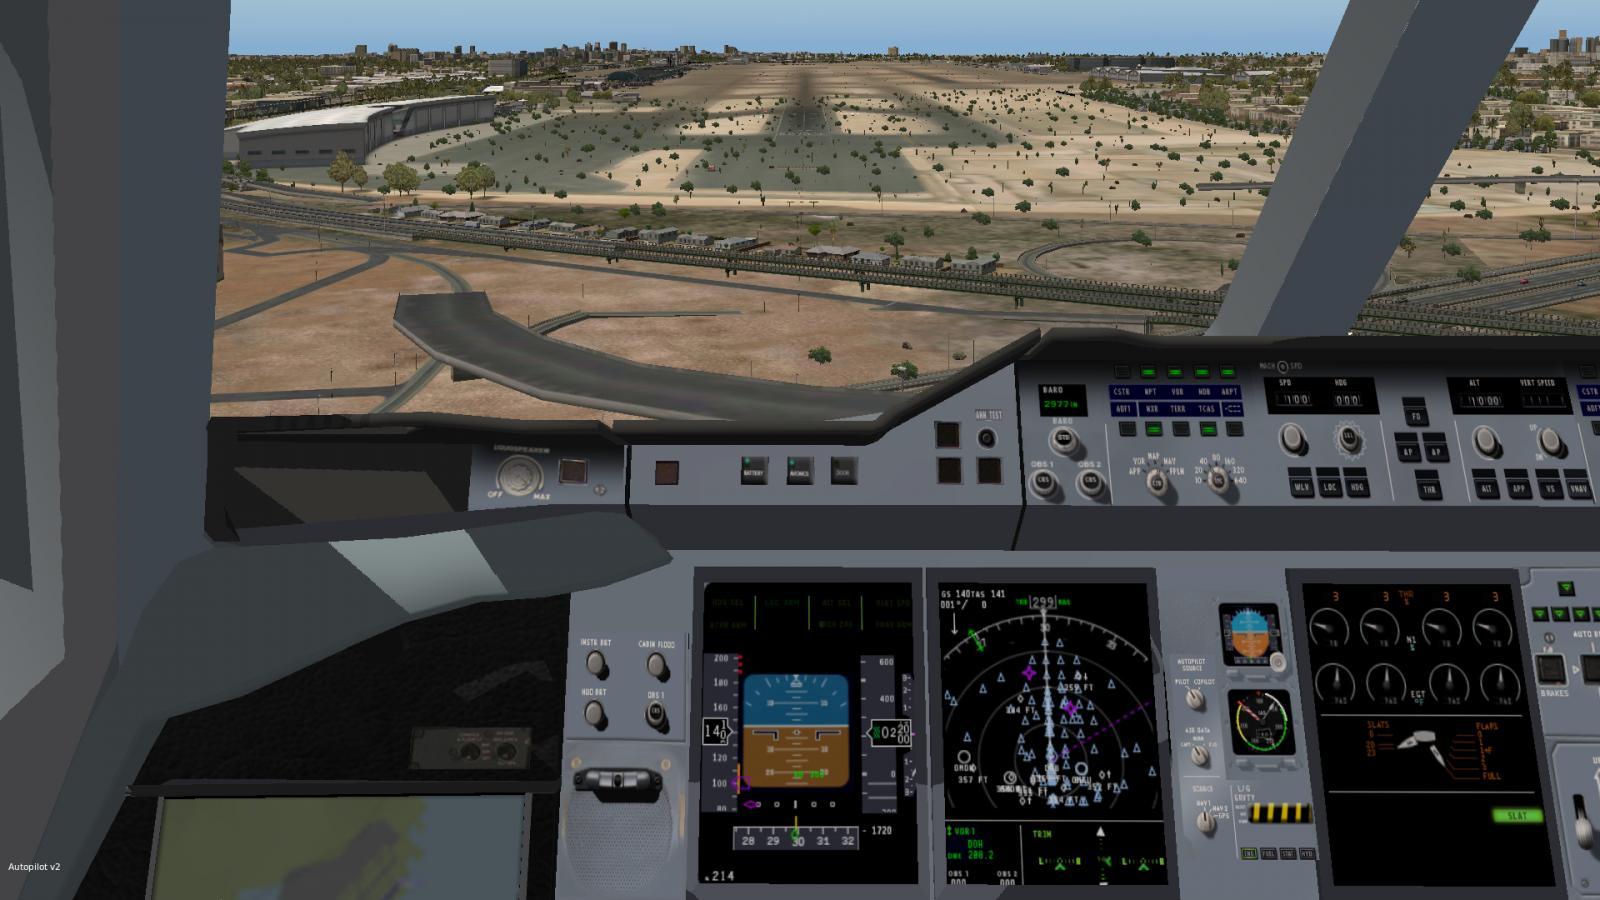 FlyTampa Dubai Not Working - Scenery Development Forum - X-Plane Org